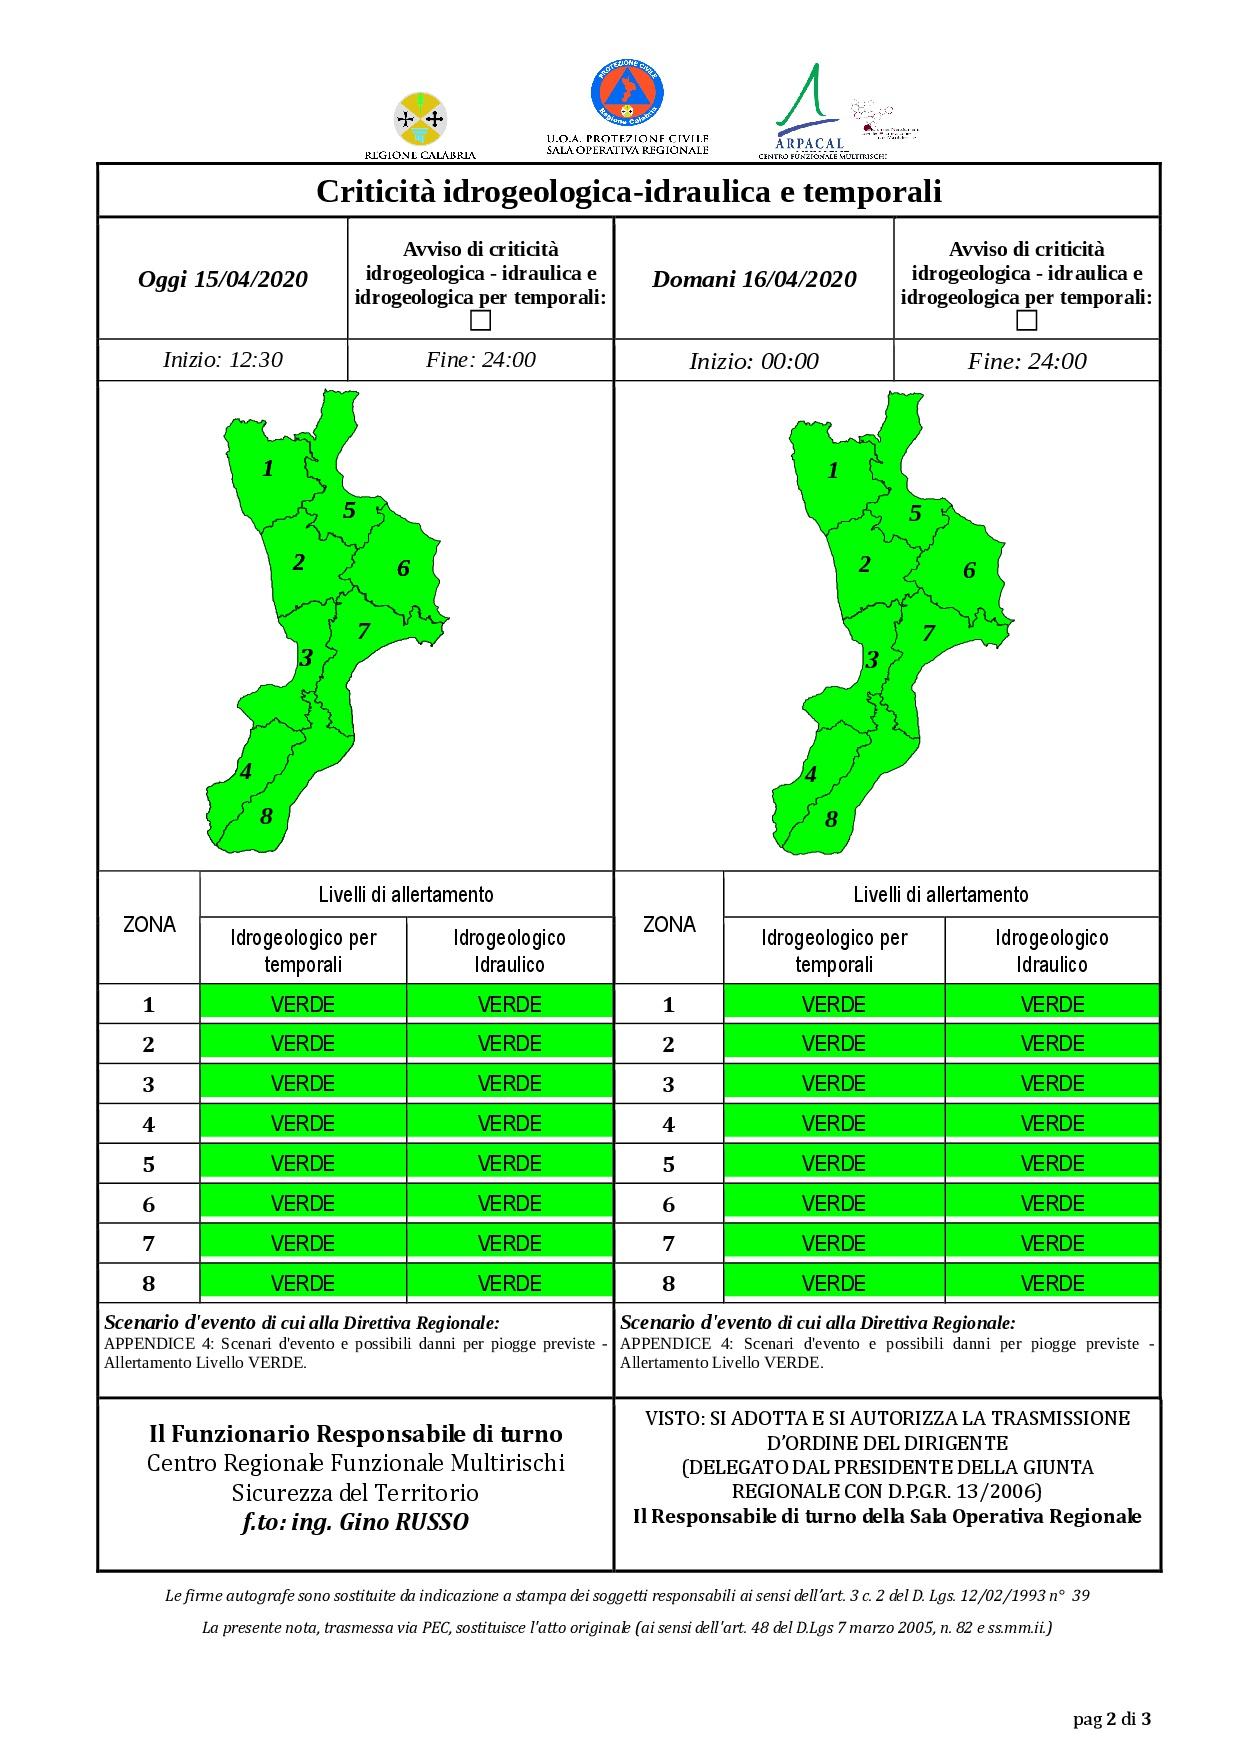 Criticità idrogeologica-idraulica e temporali in Calabria 15-04-2020